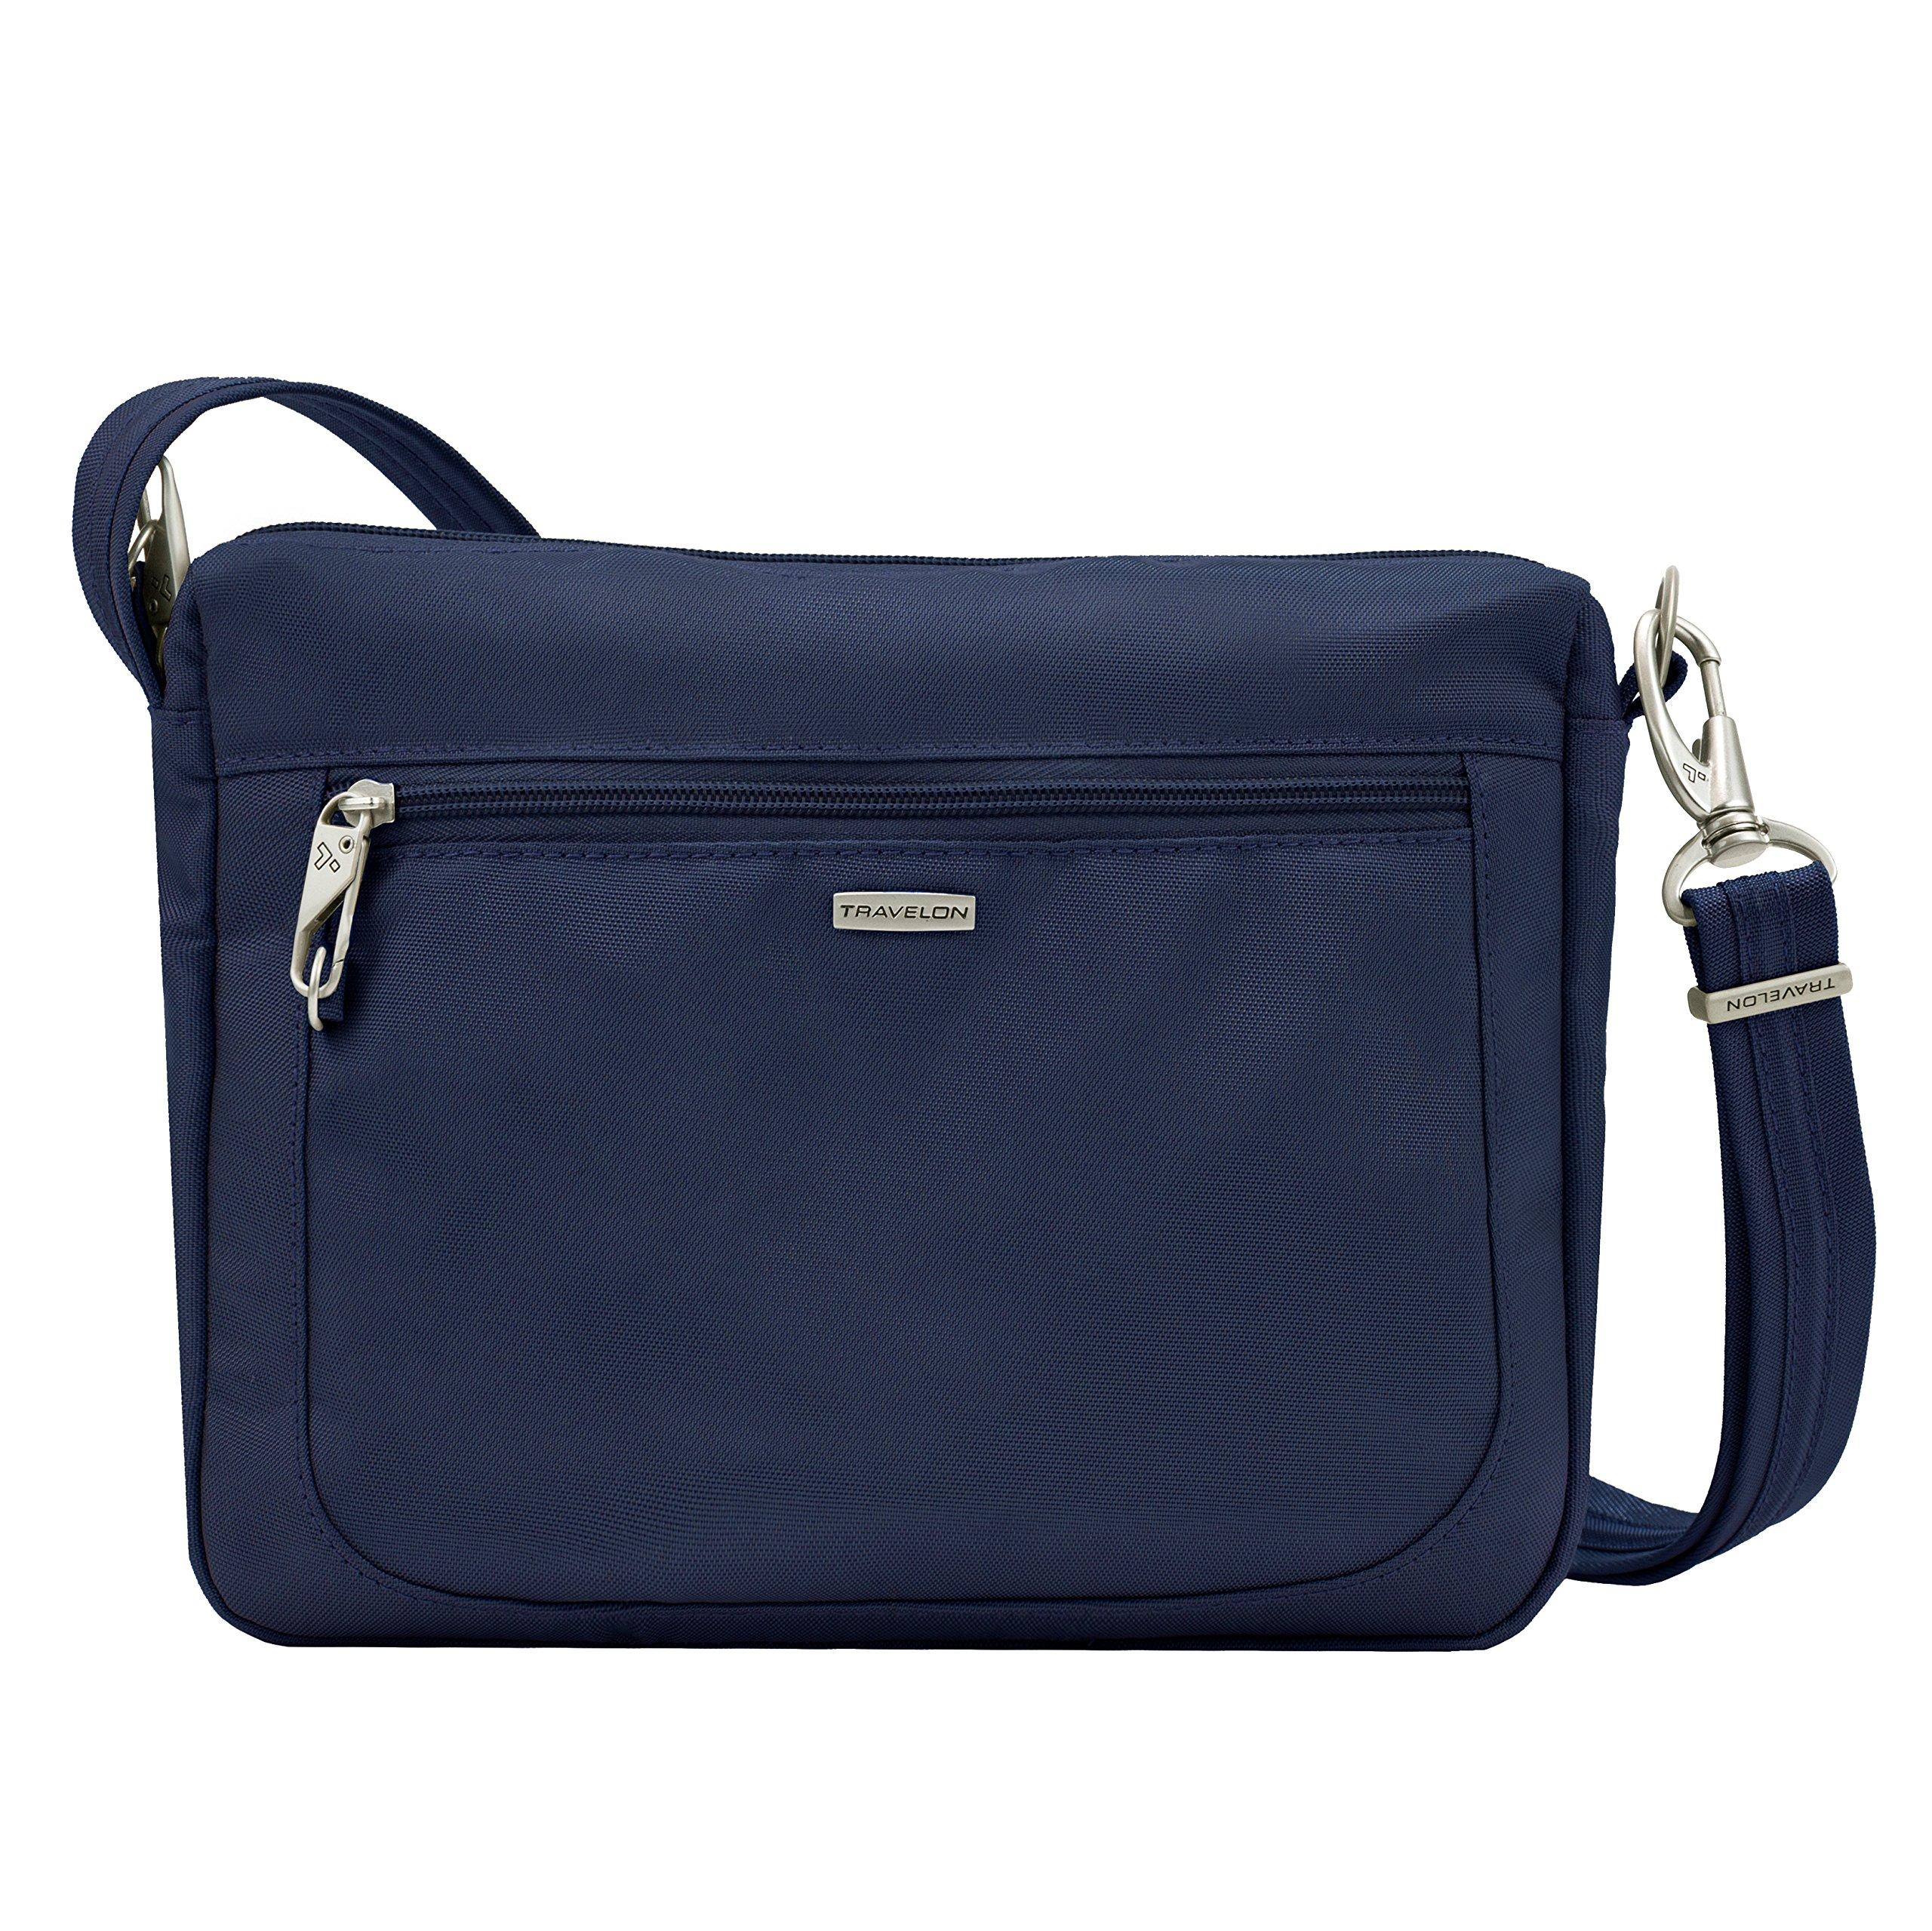 Travelon Anti-Theft Classic Small E/w Crossbody Bag, Midnight